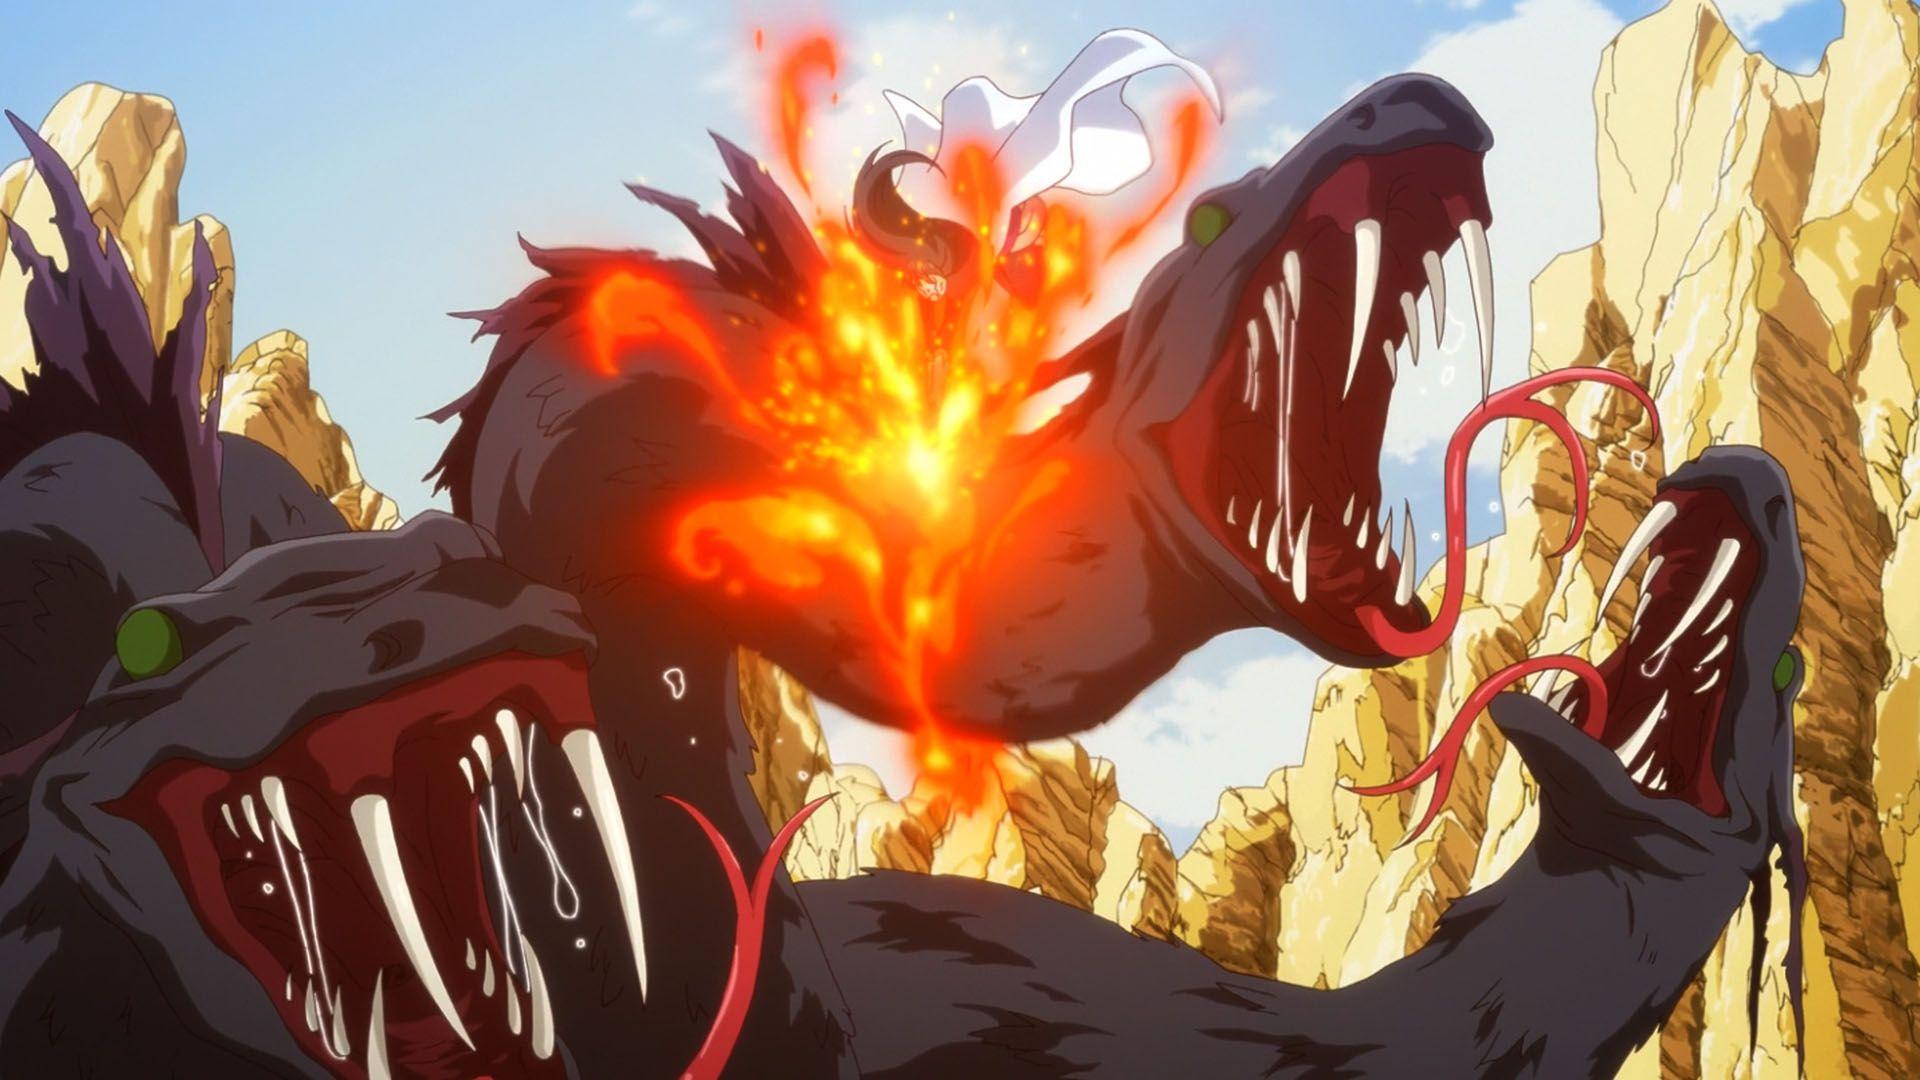 Reseña / Tensei Shitara Slime Datta Ken / Episodio 8